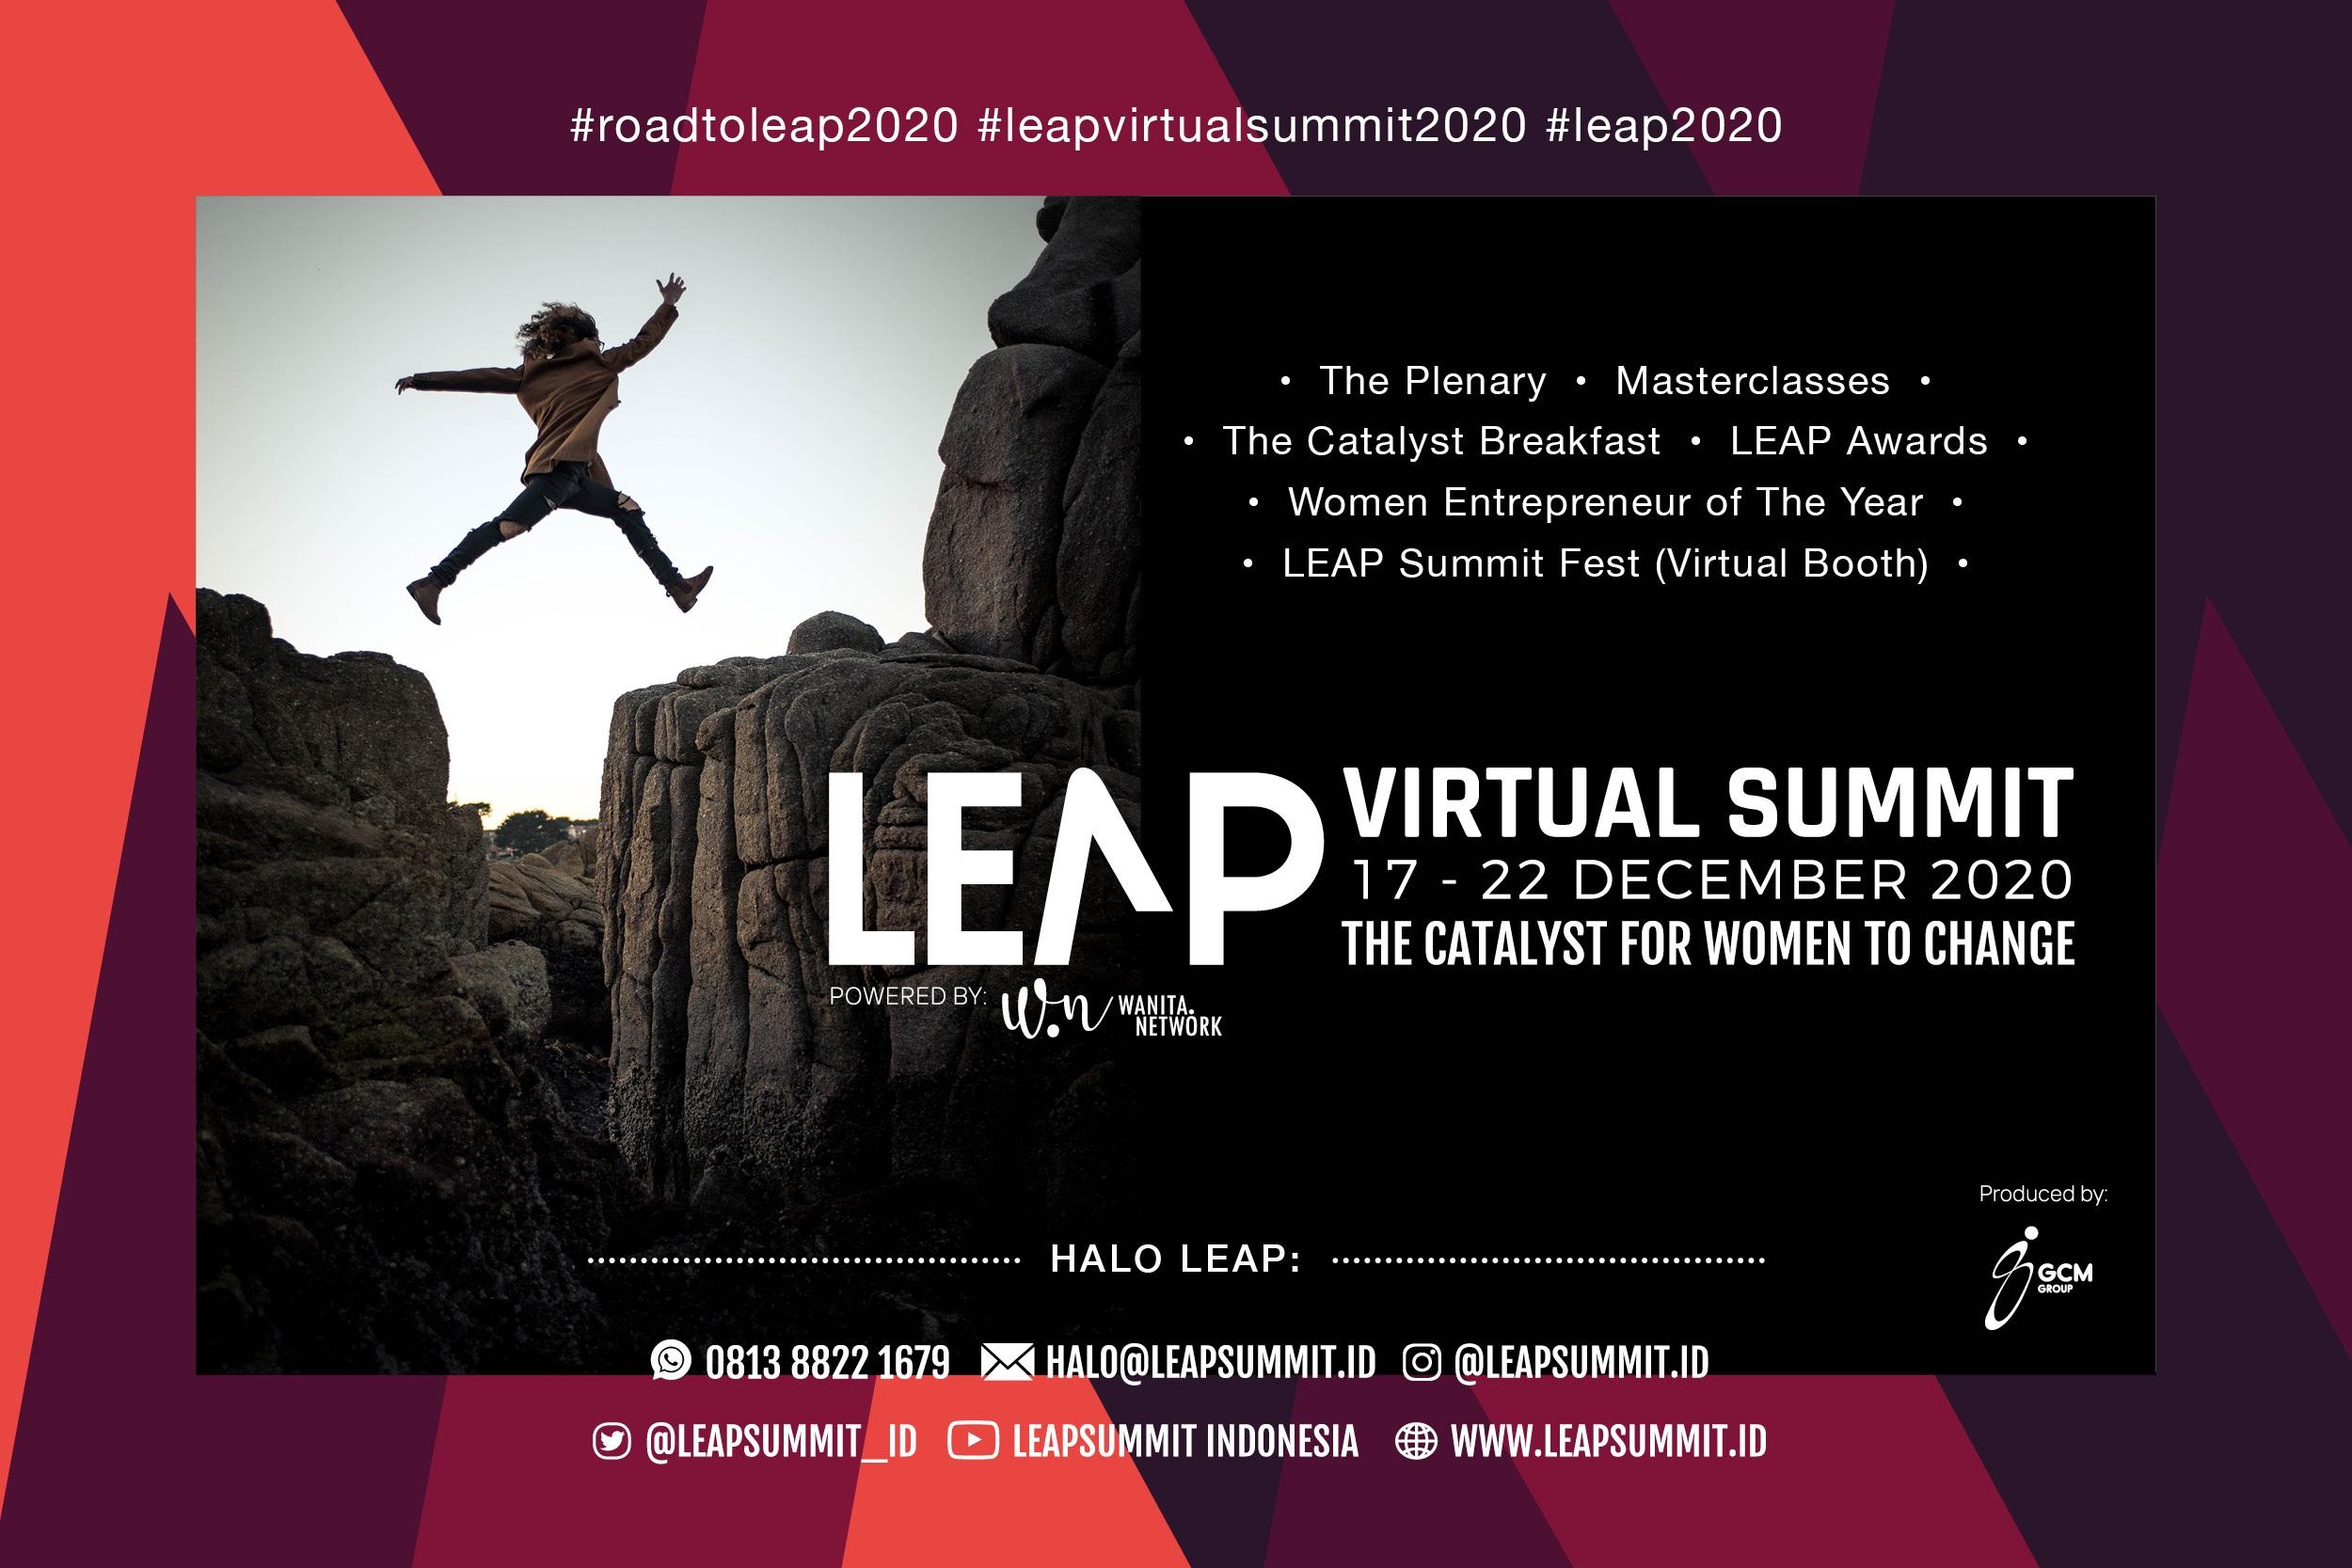 Coming Soon! LEAP VIRTUAL SUMMIT 2020